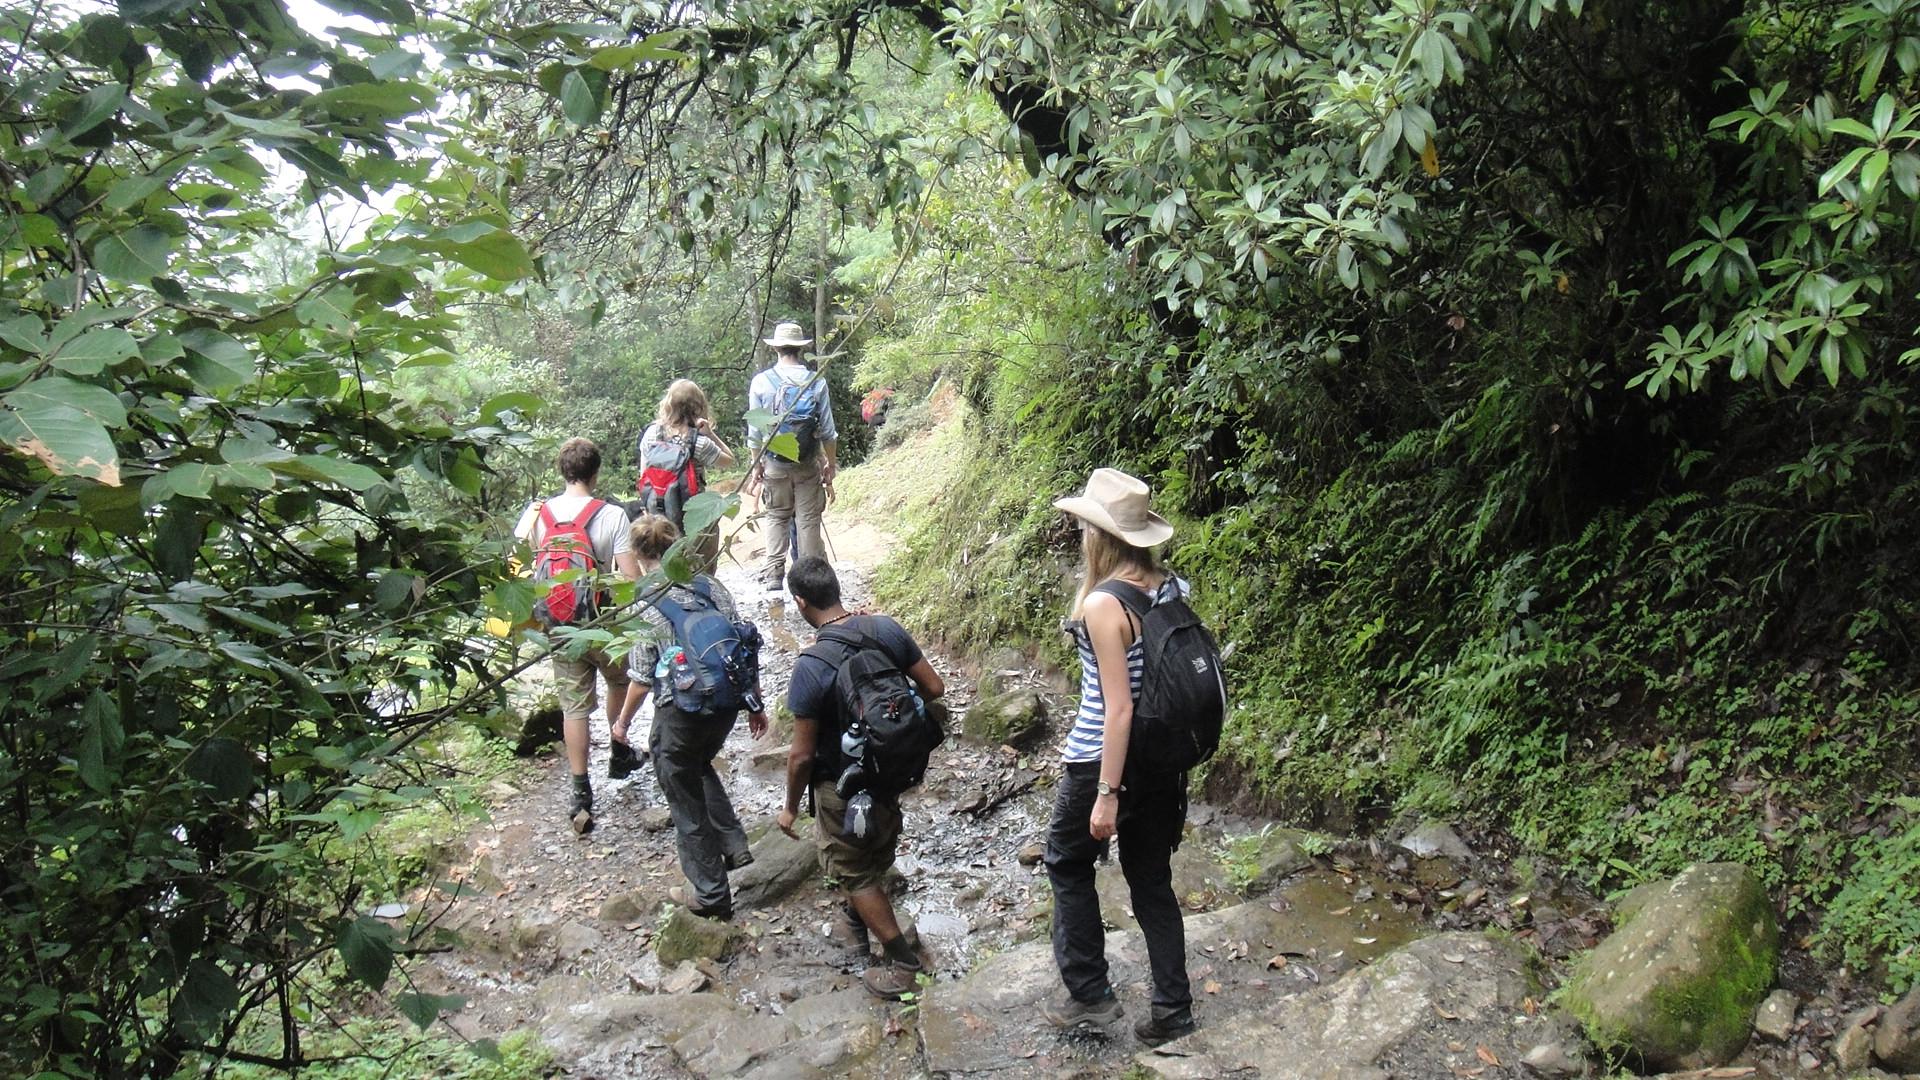 Volunteering_Medical_Trekking_Adventure_Alternative_Nepal.JPG